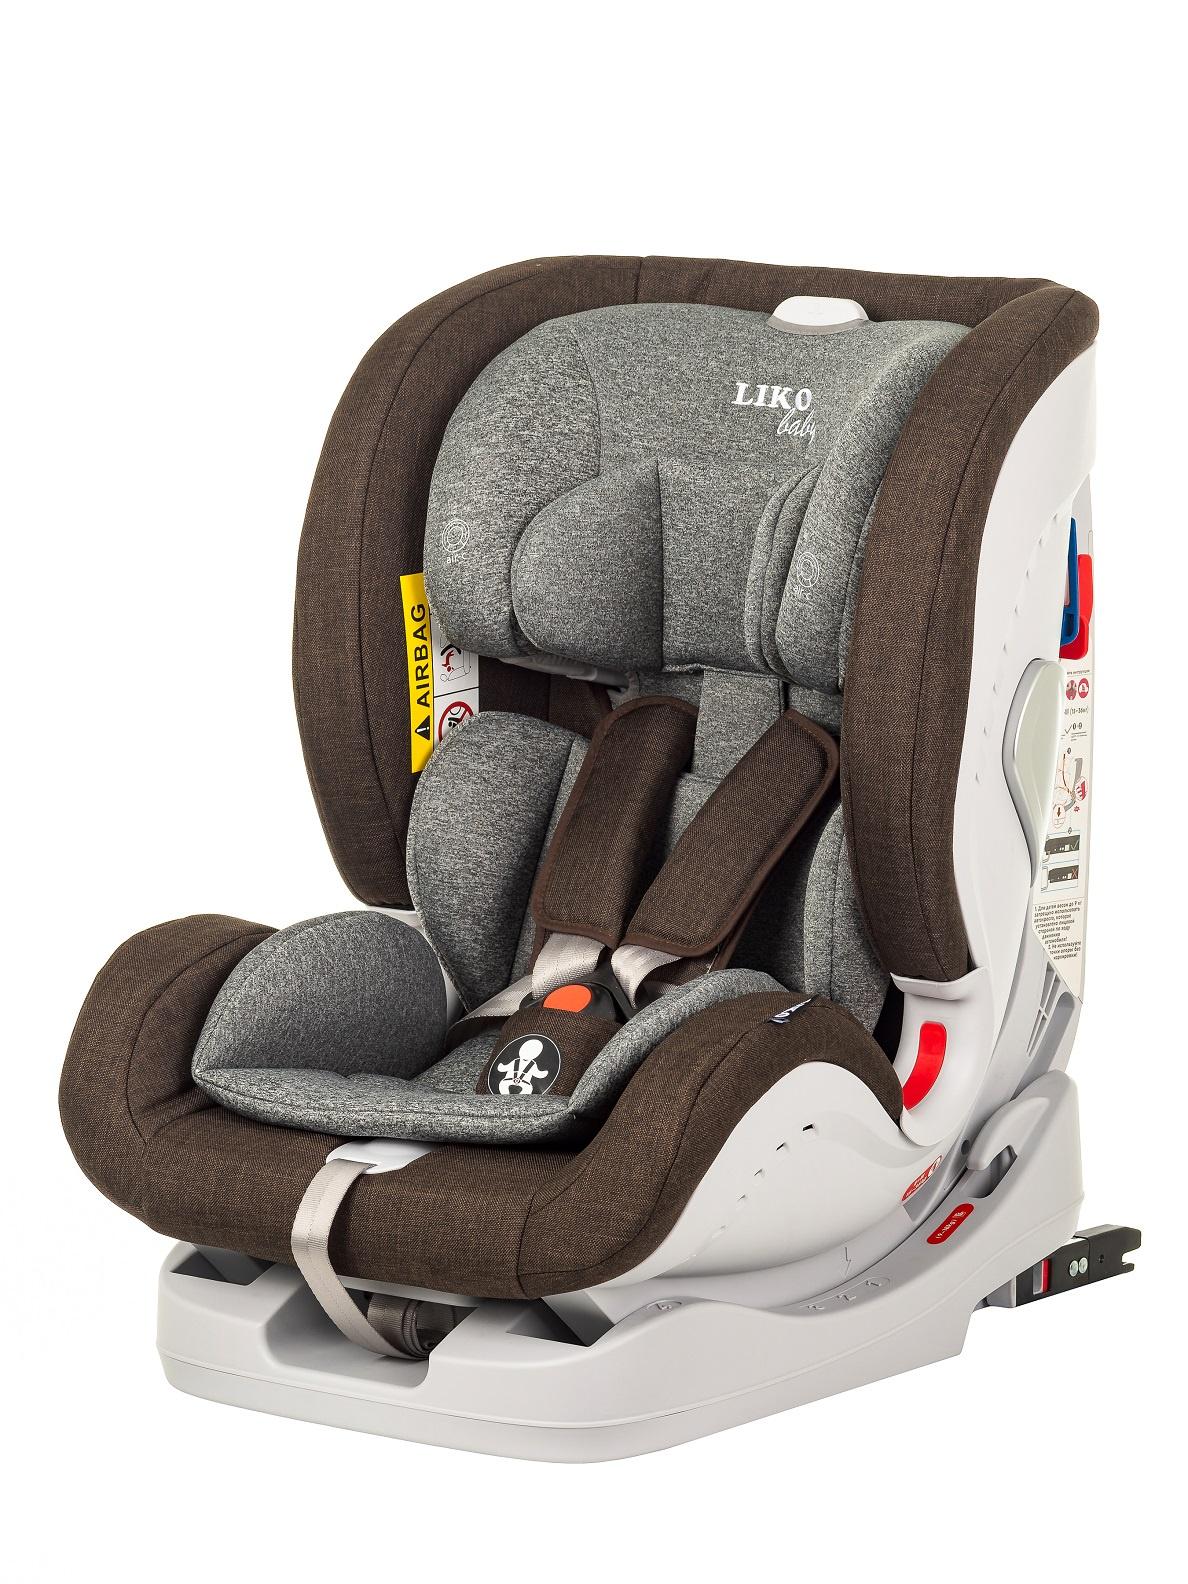 Автокресло LIKO BABY SPRINTER детское автокресло liko baby lb303c beige brown